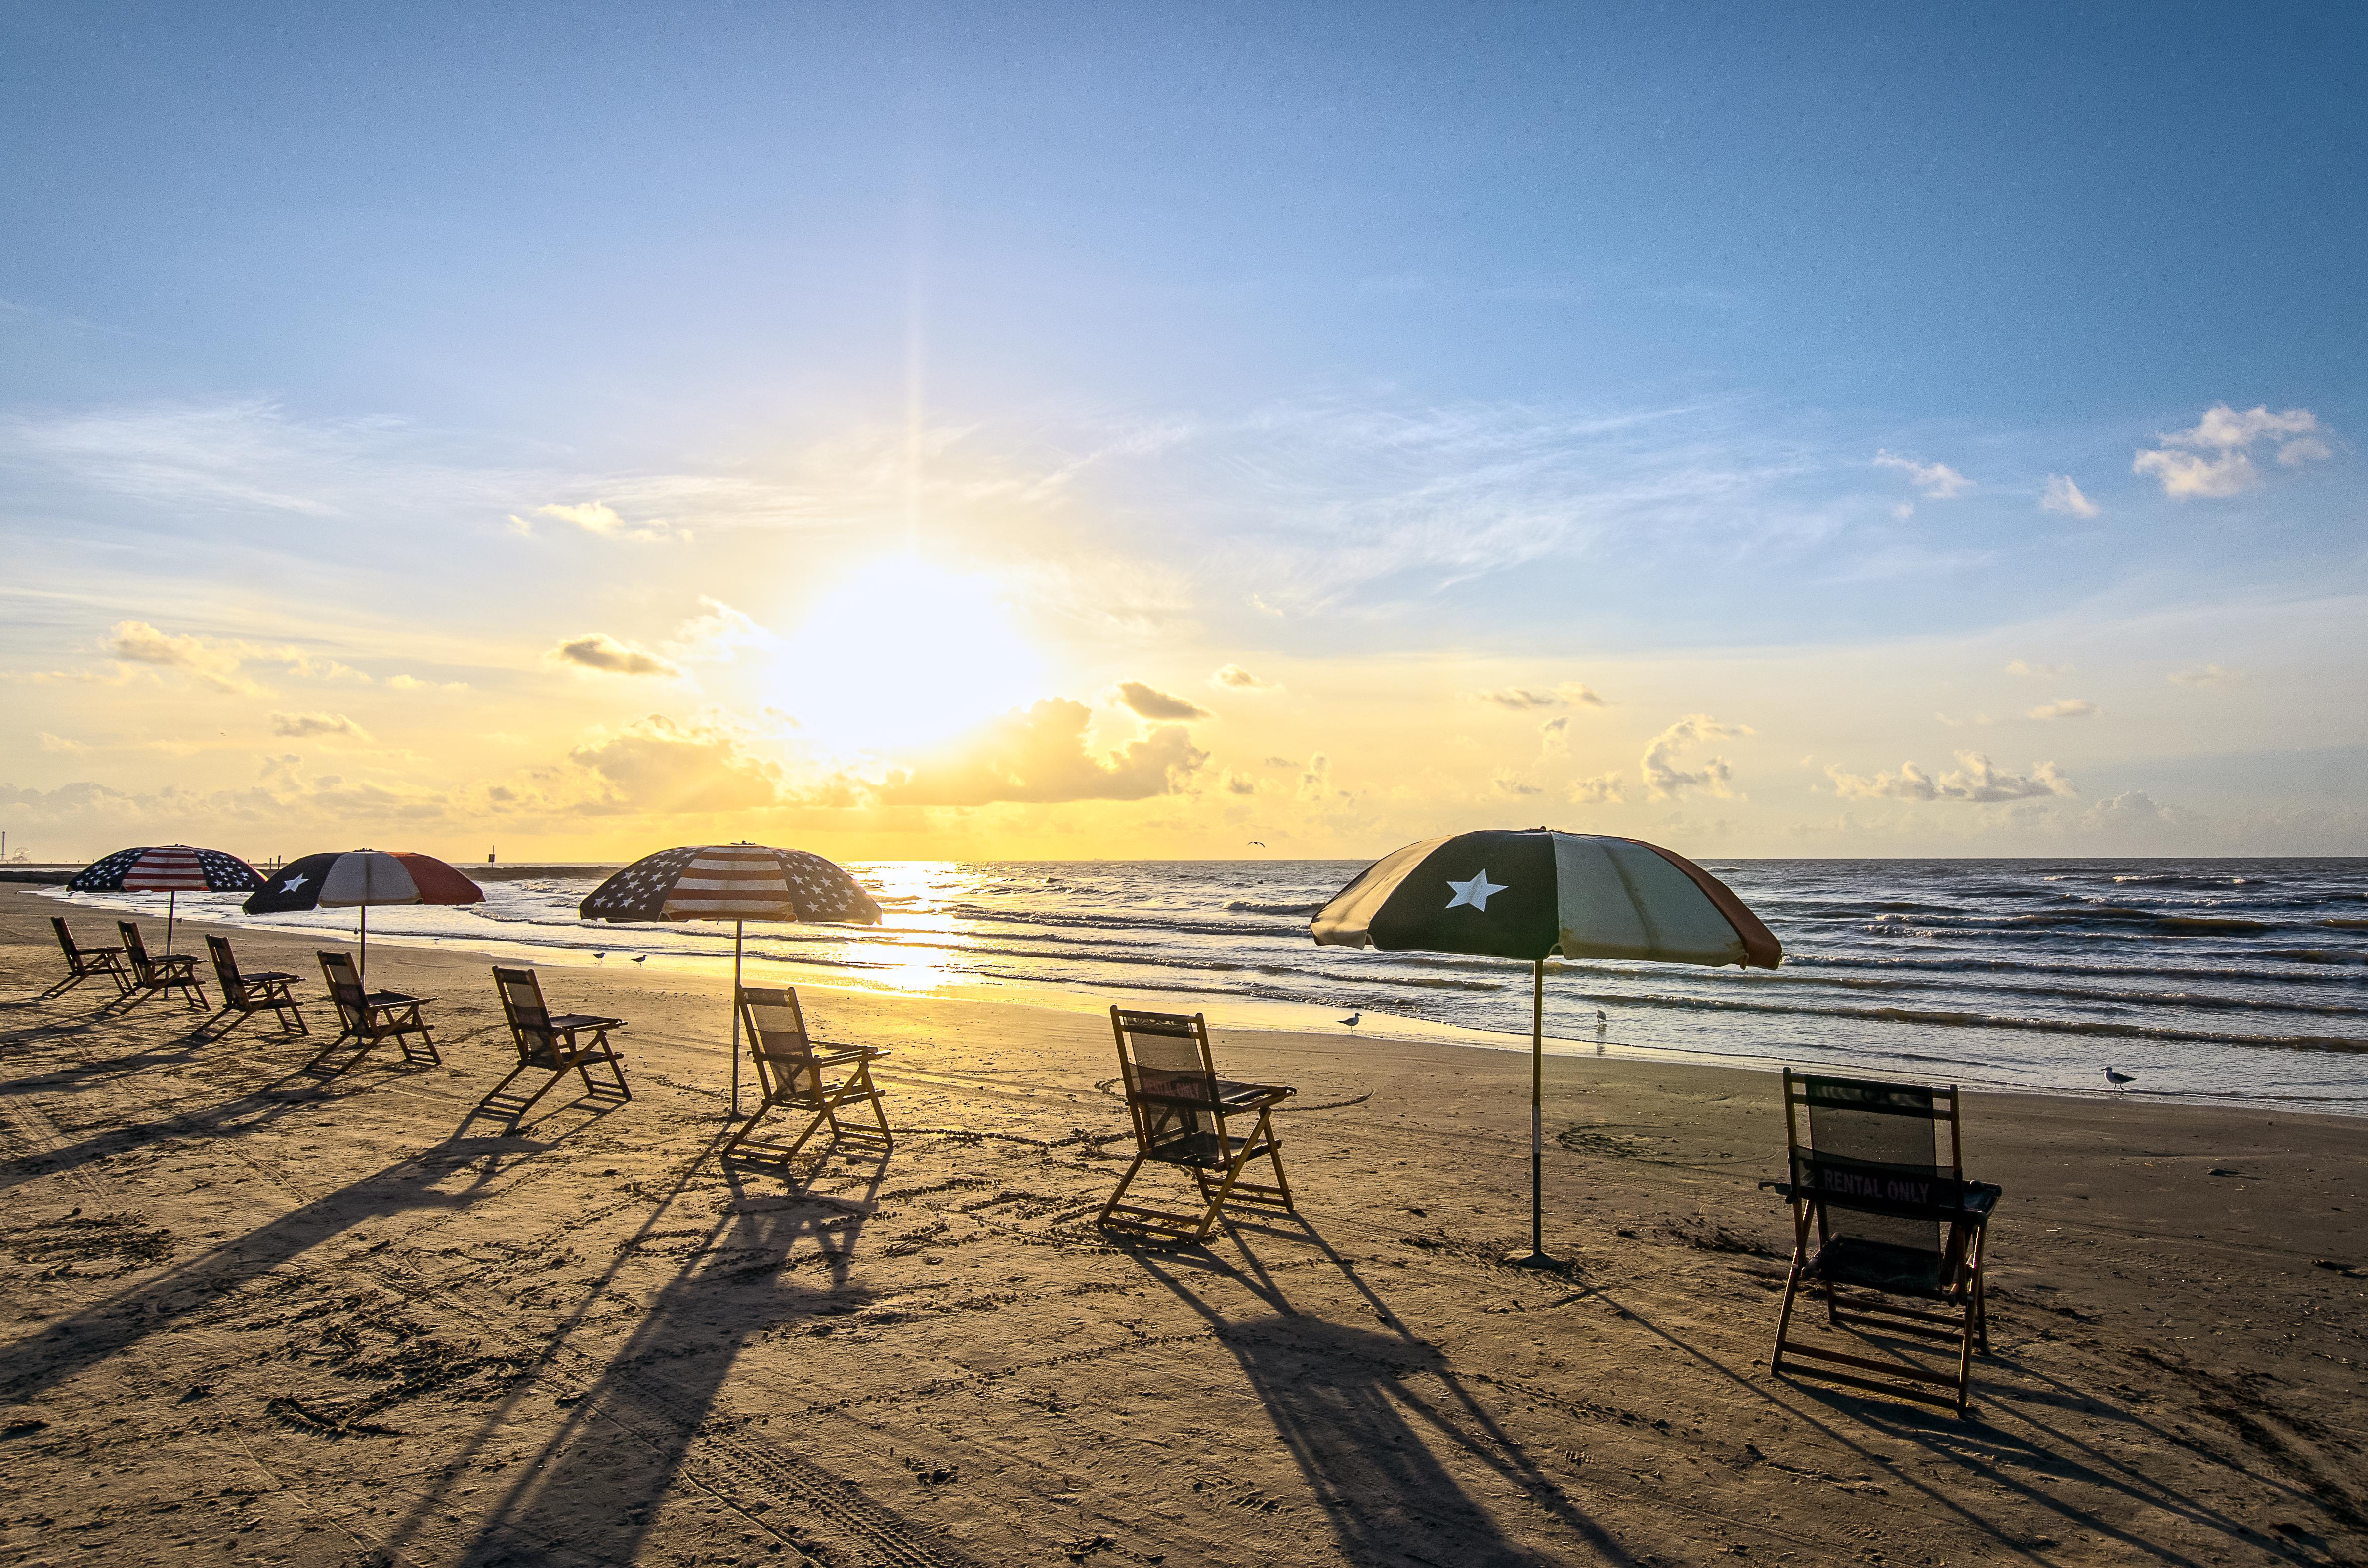 galveston island tx 2014 life 39 s a beach triathlon. Black Bedroom Furniture Sets. Home Design Ideas